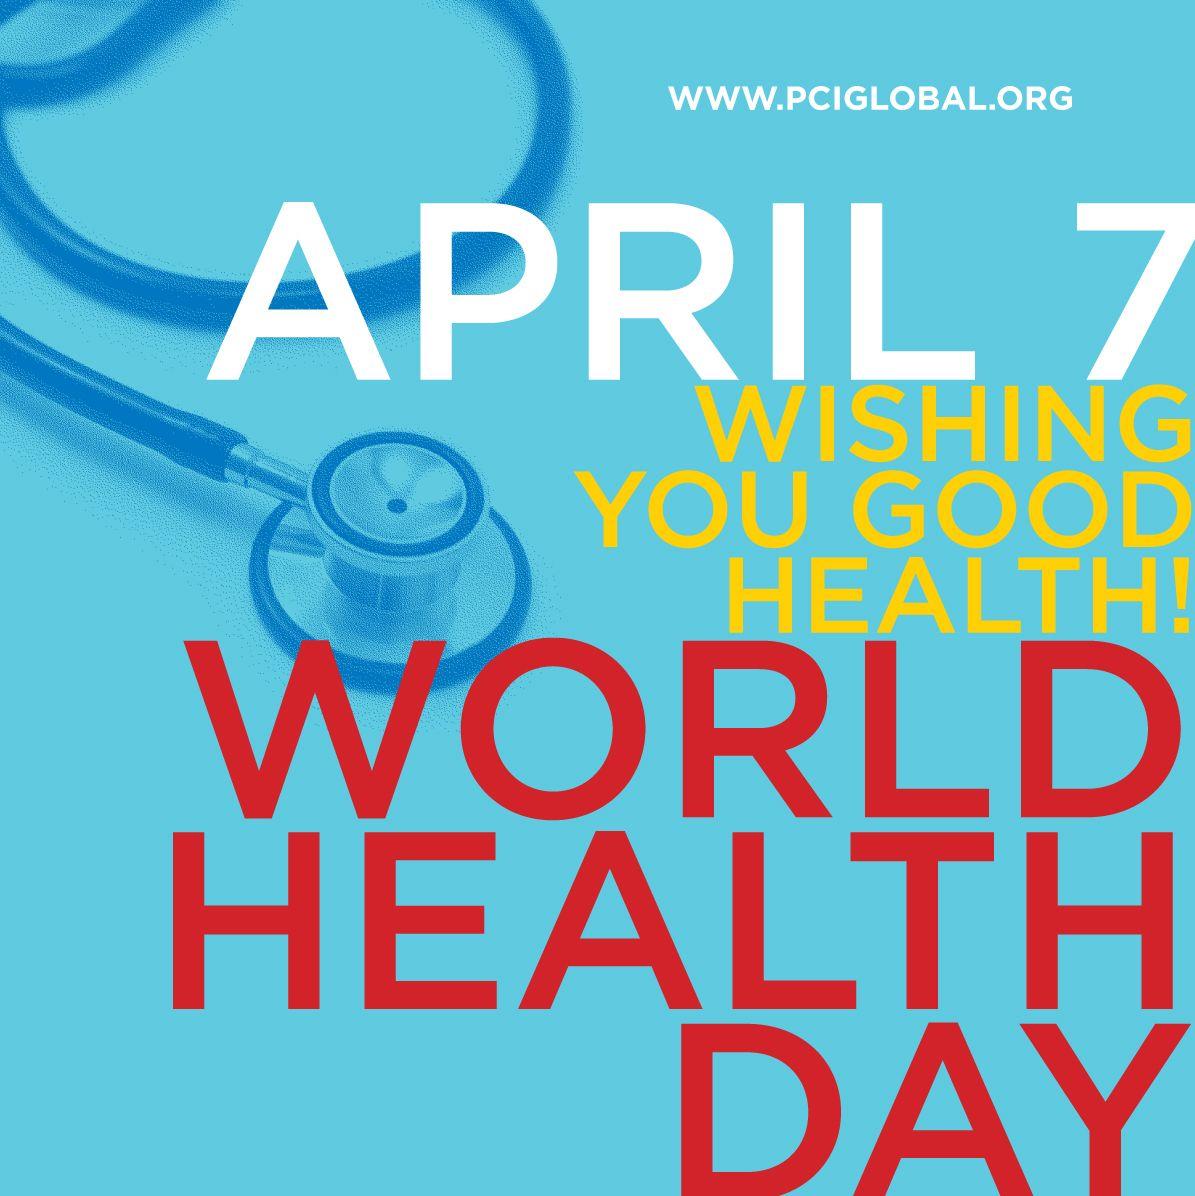 World Health Day April 7th Health Worldhealthday